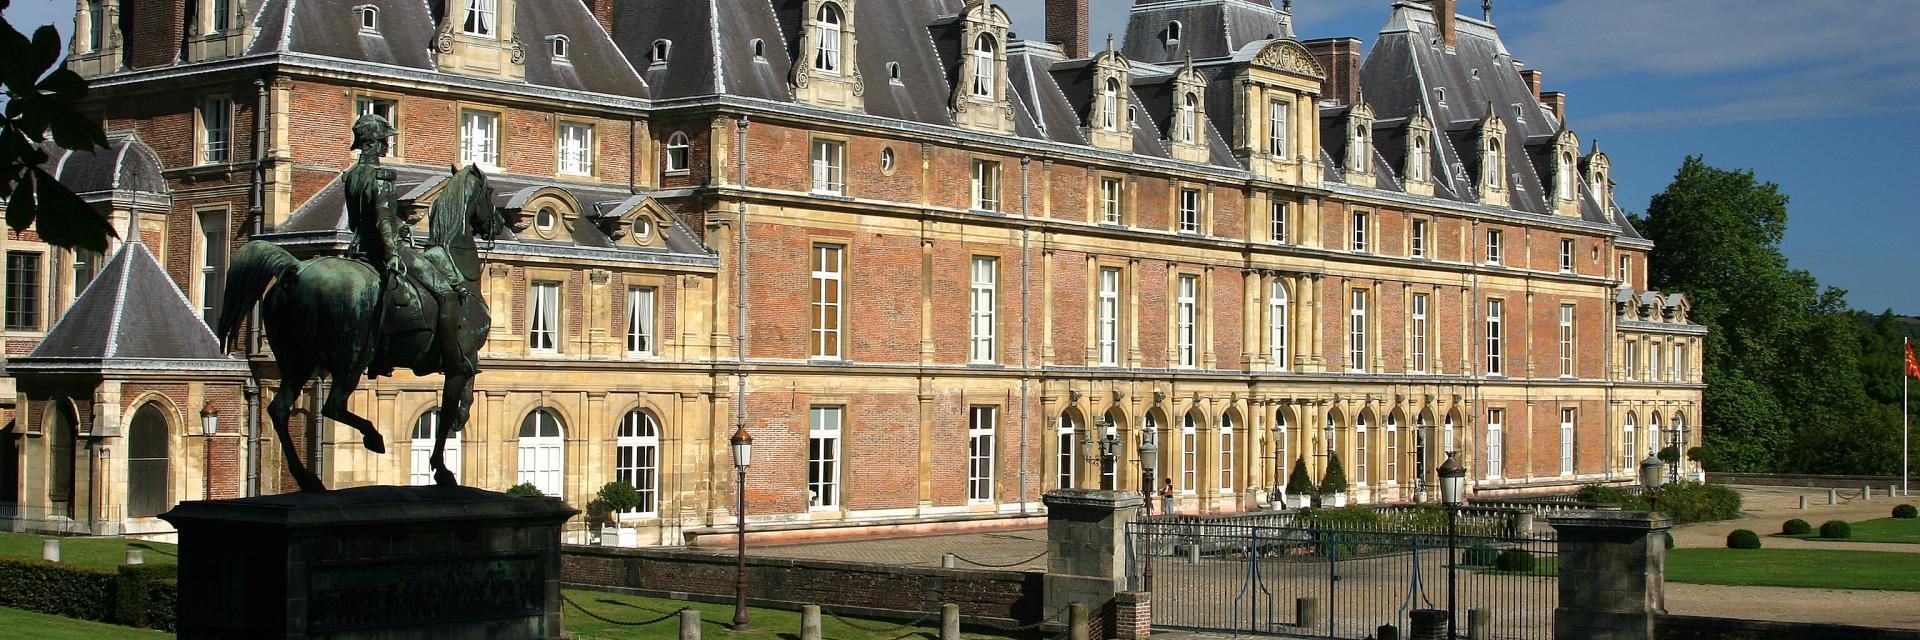 Eu Chateau 2015 (1)